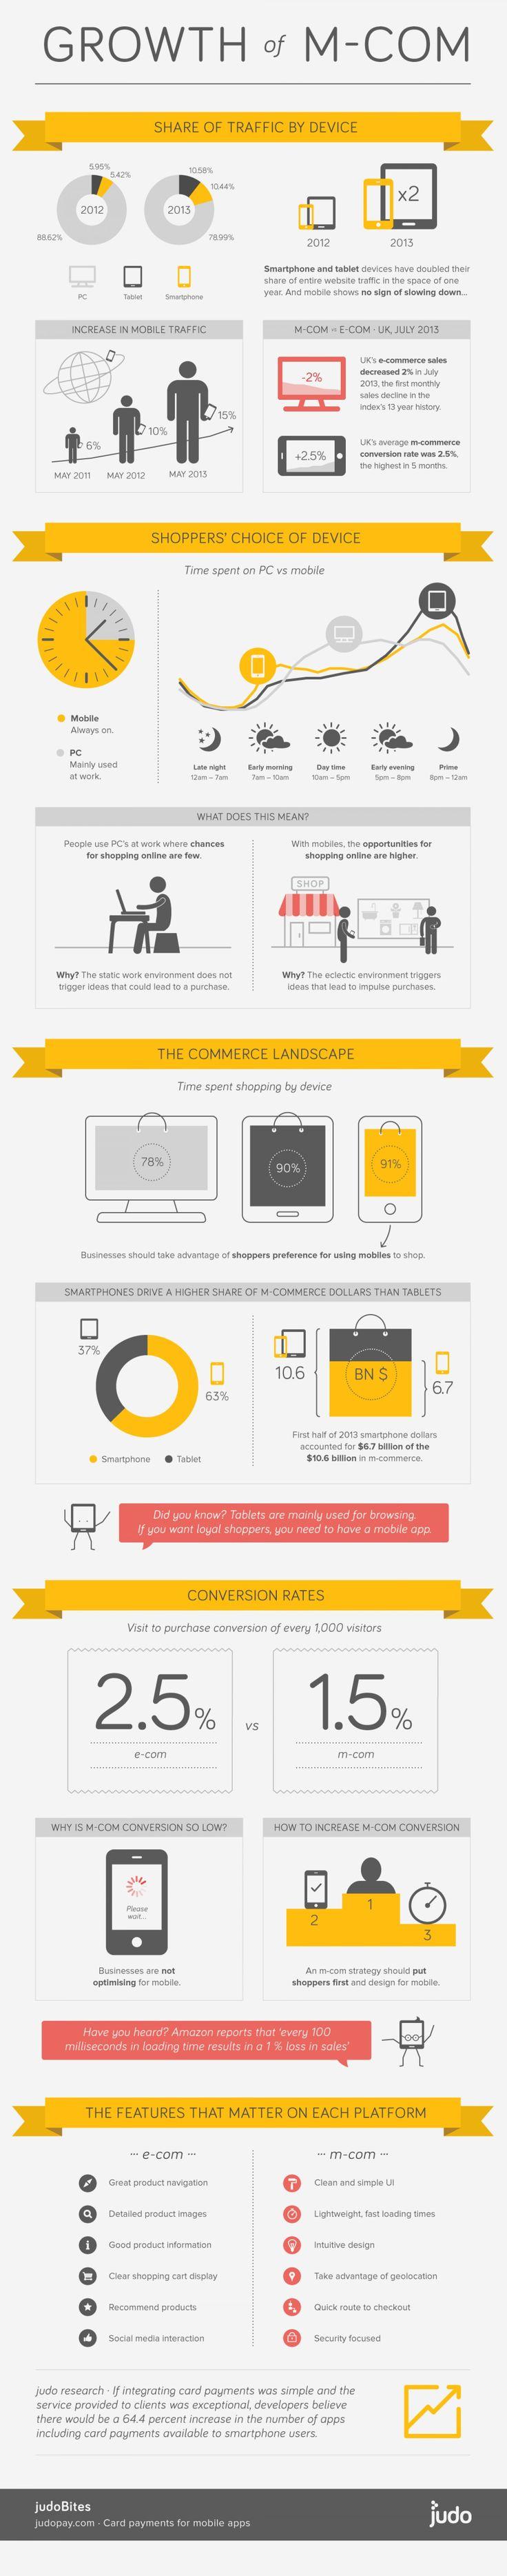 24 best Infographic images on Pinterest | Digital marketing, Inbound ...